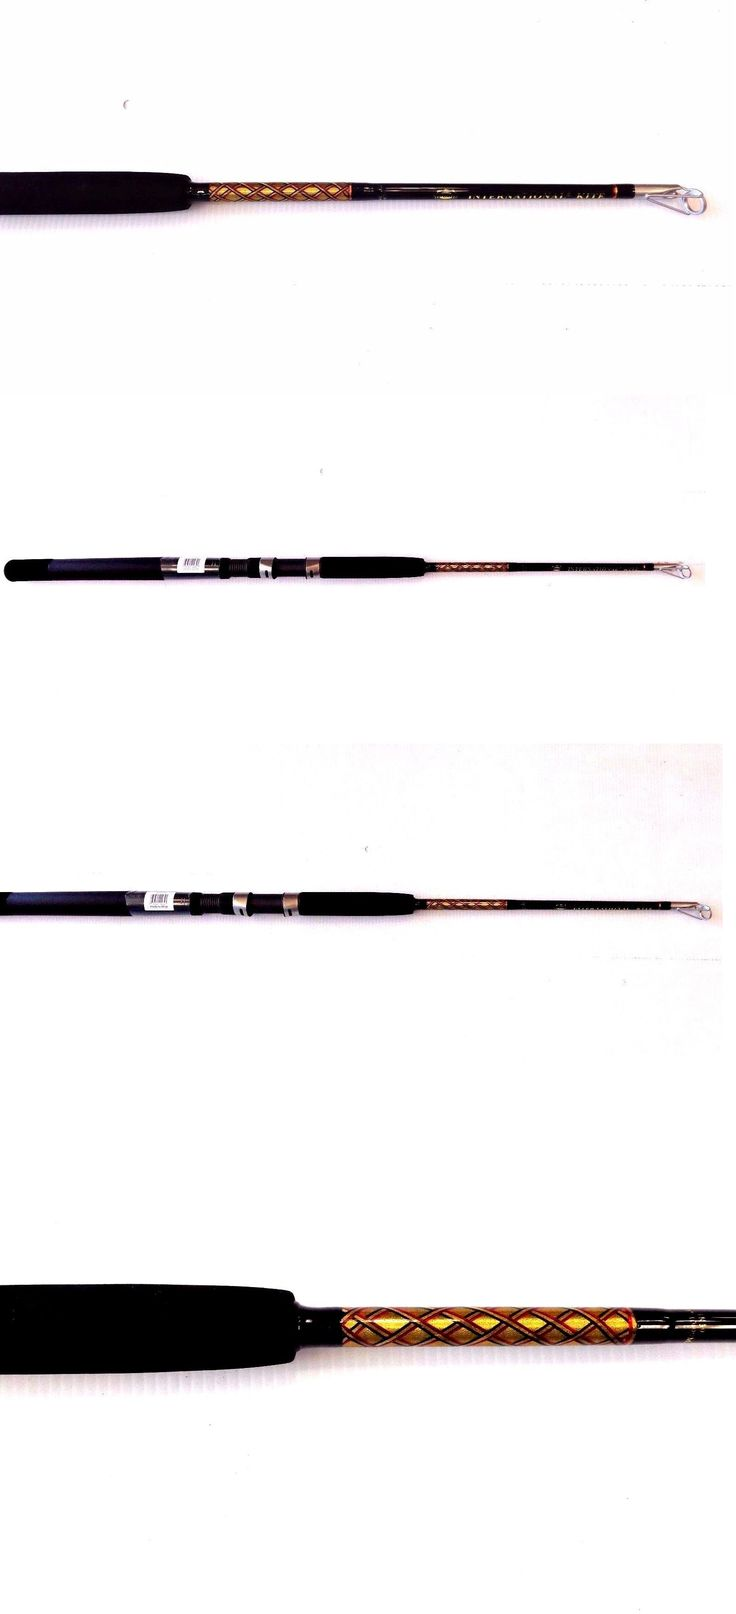 Surf Rods 56734: Penn International Kite Casting Rod Ik39 - 33 Heavy Action Fishing Rod New BUY IT NOW ONLY: $54.99